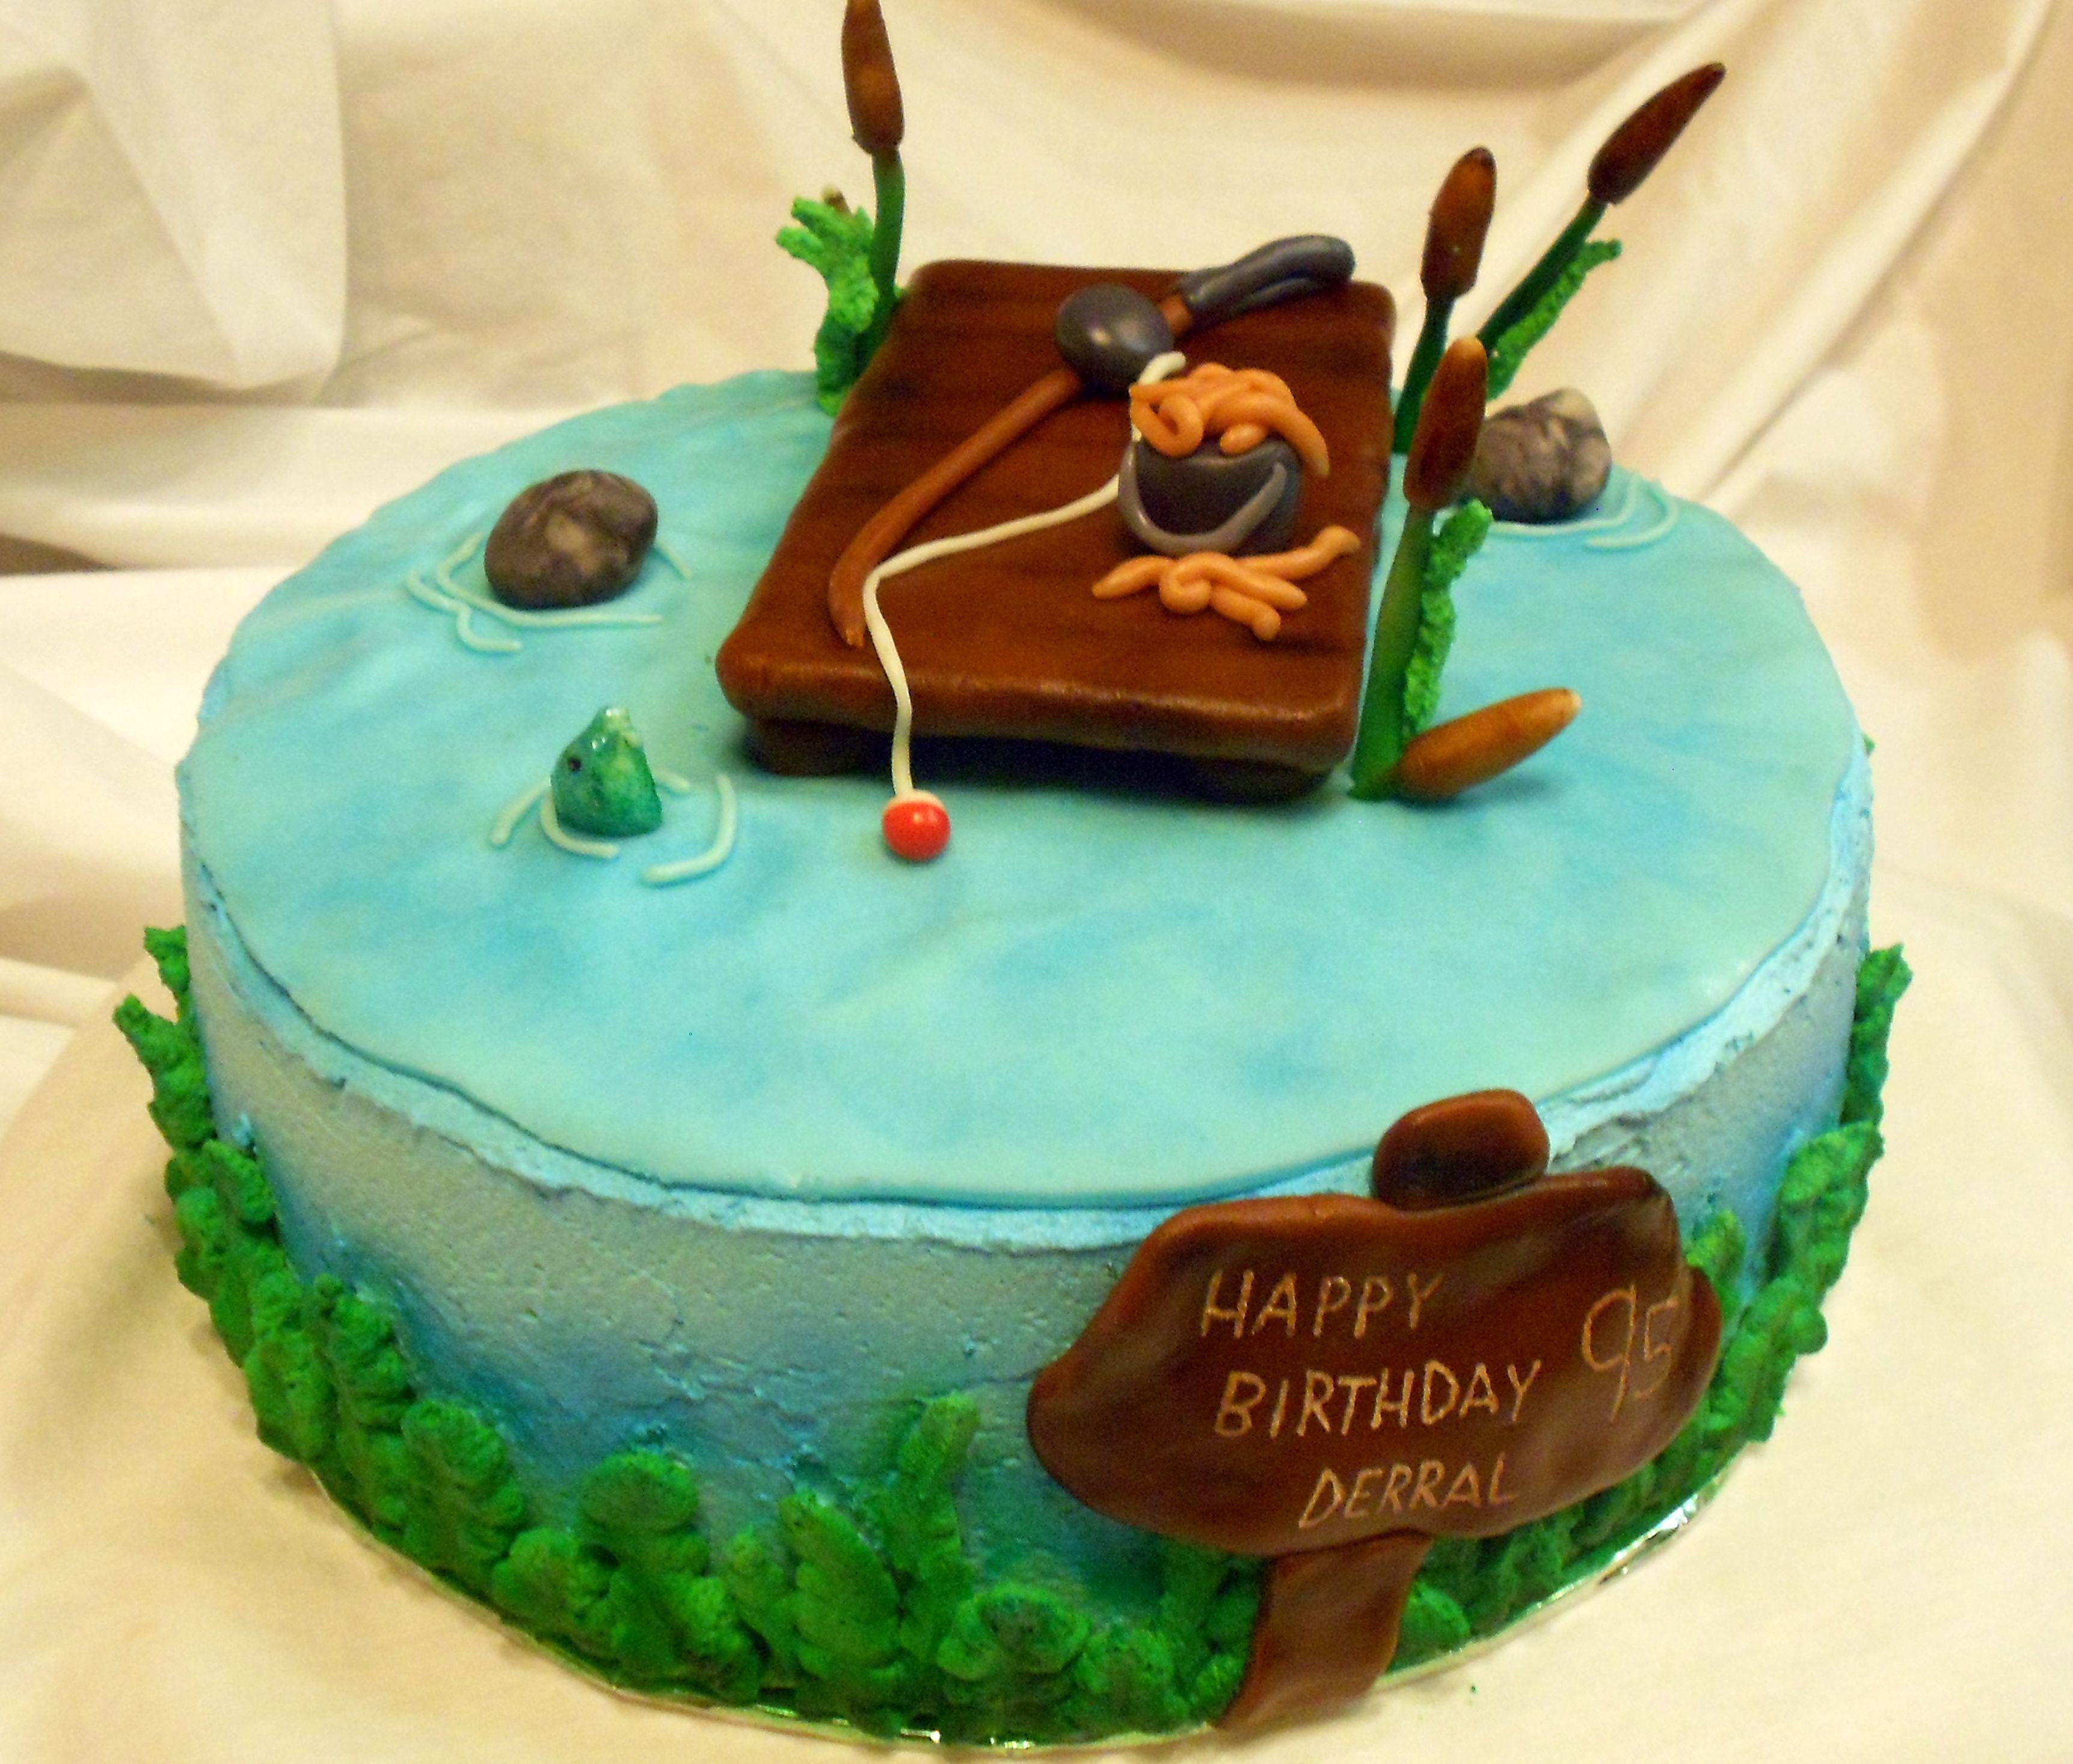 Gone Fishin'! #adeliciousday #cake #customcake #fishin' #fishing #ogden #tonyastoker #utah